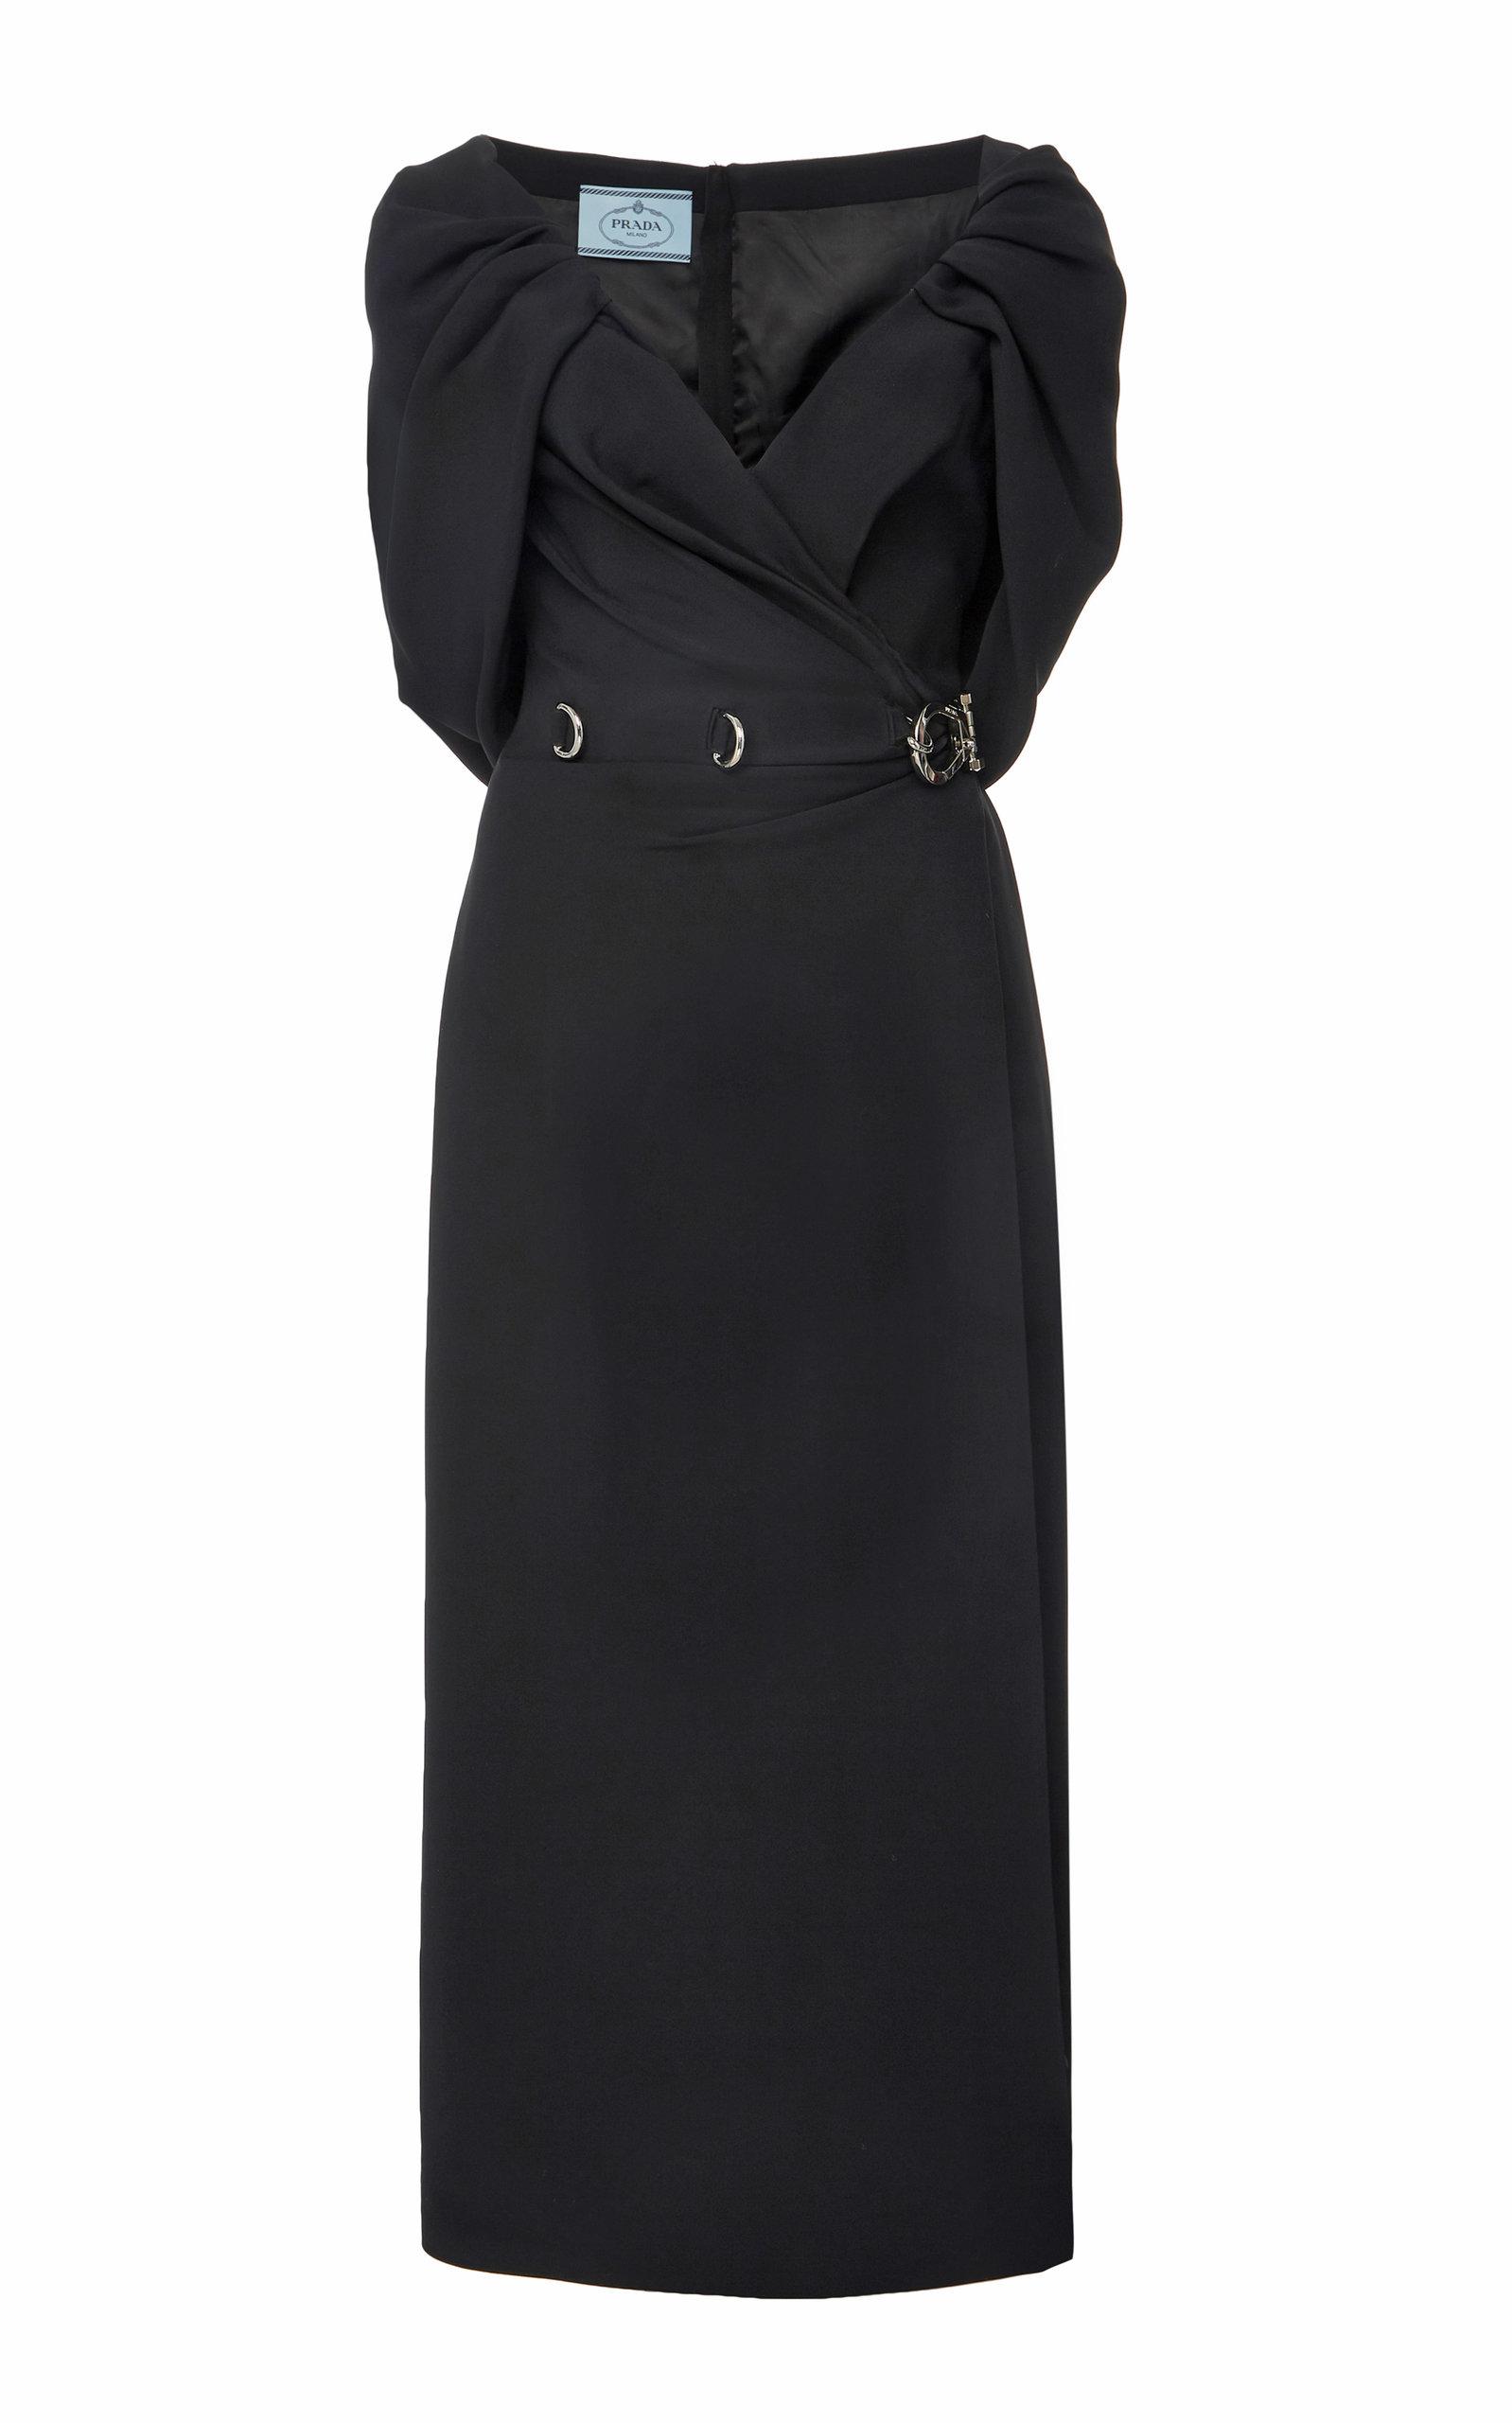 Buy Prada Draped Cady Midi Dress online, shop Prada at the best price